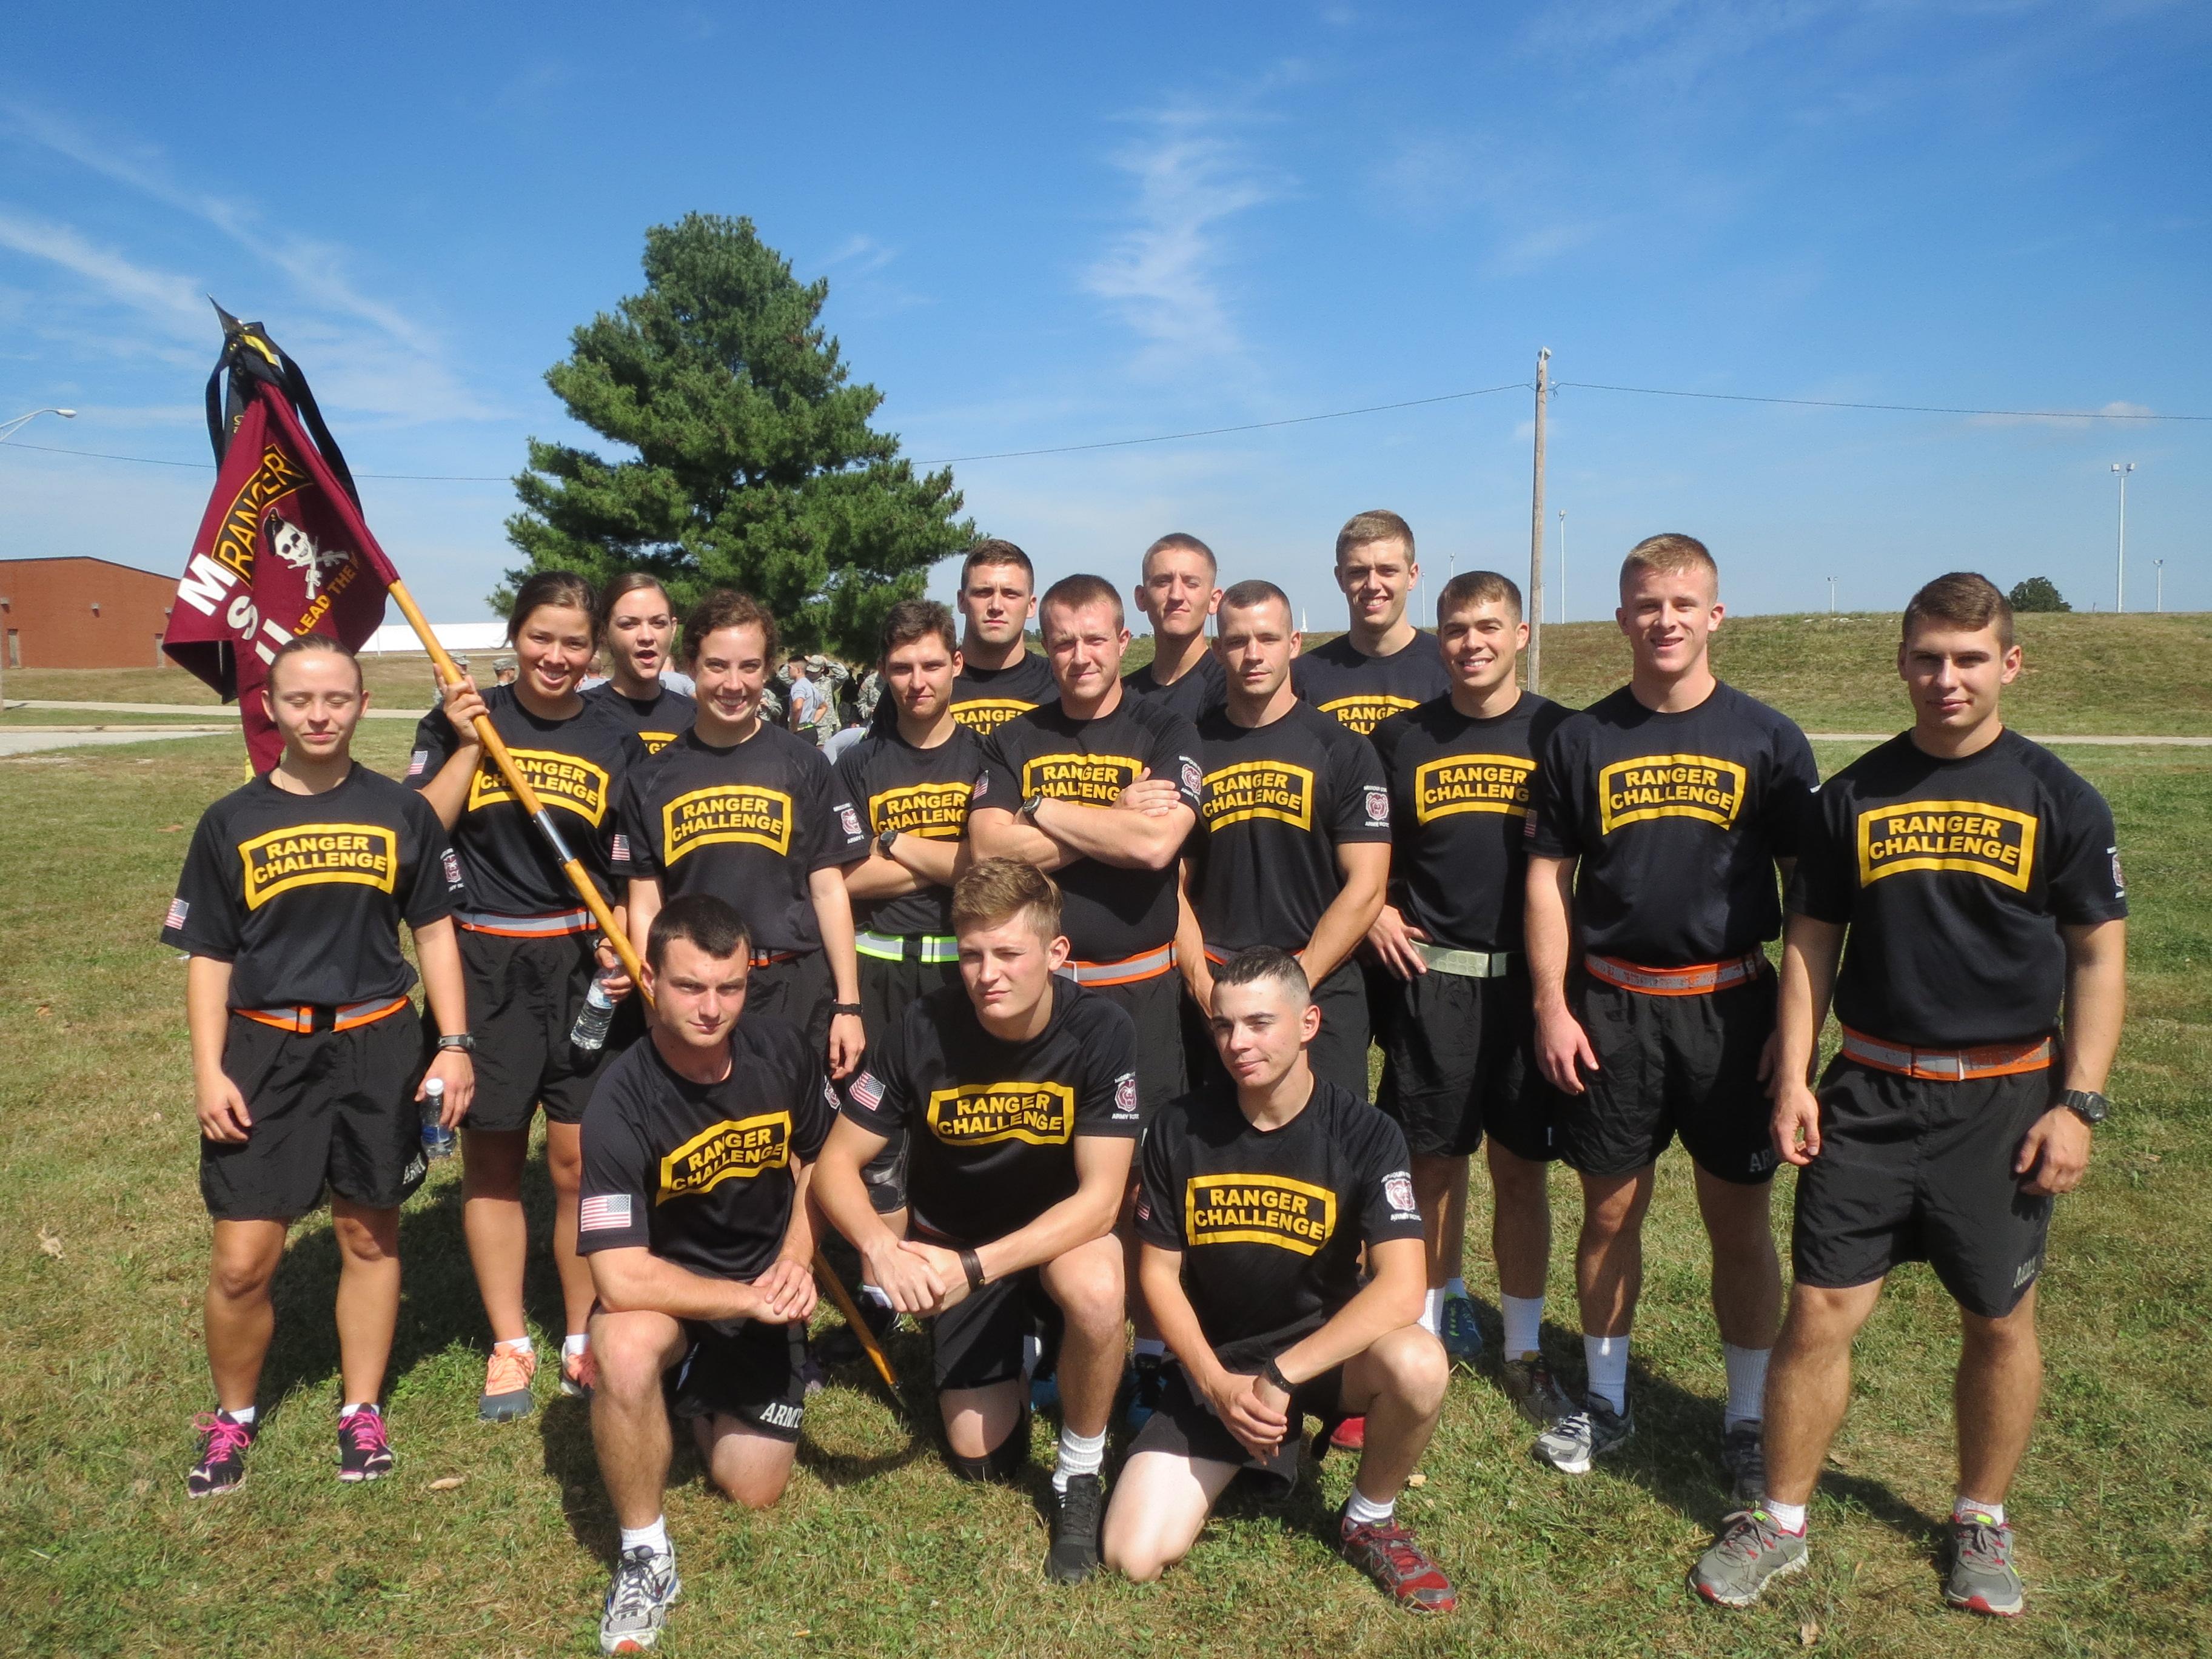 ROTC Bear Battalion Ranger Challenge Teams dominate